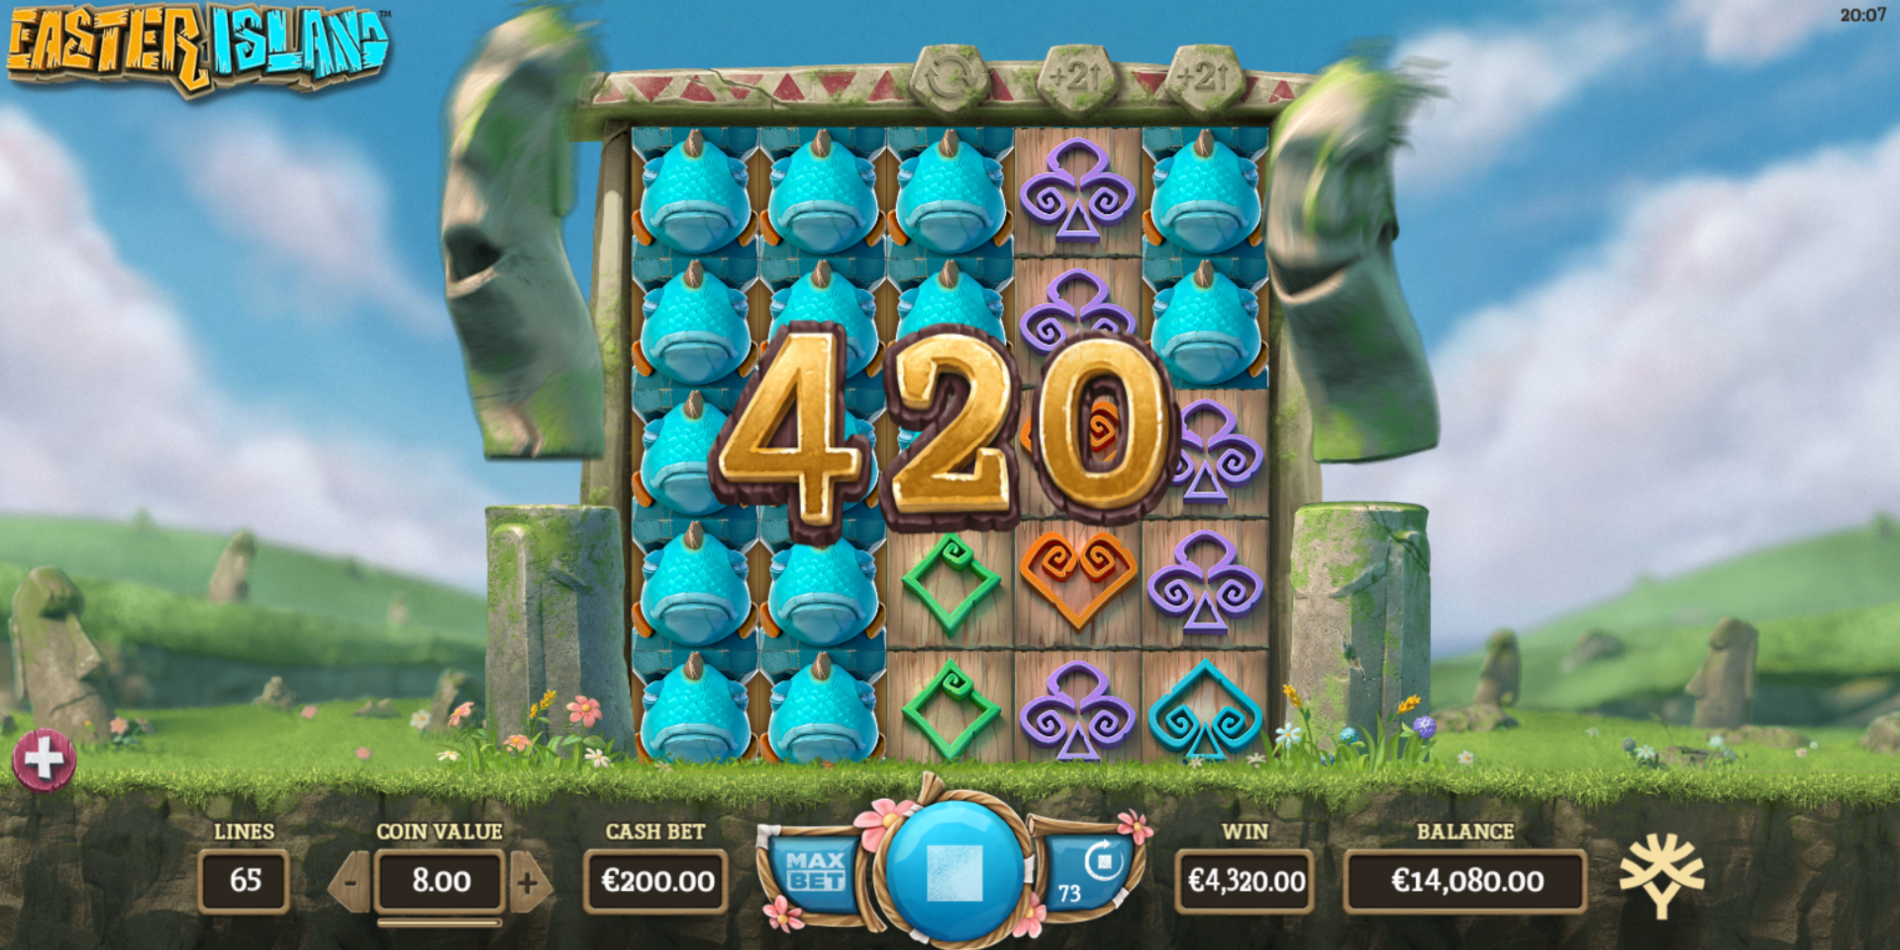 Easter Island Game